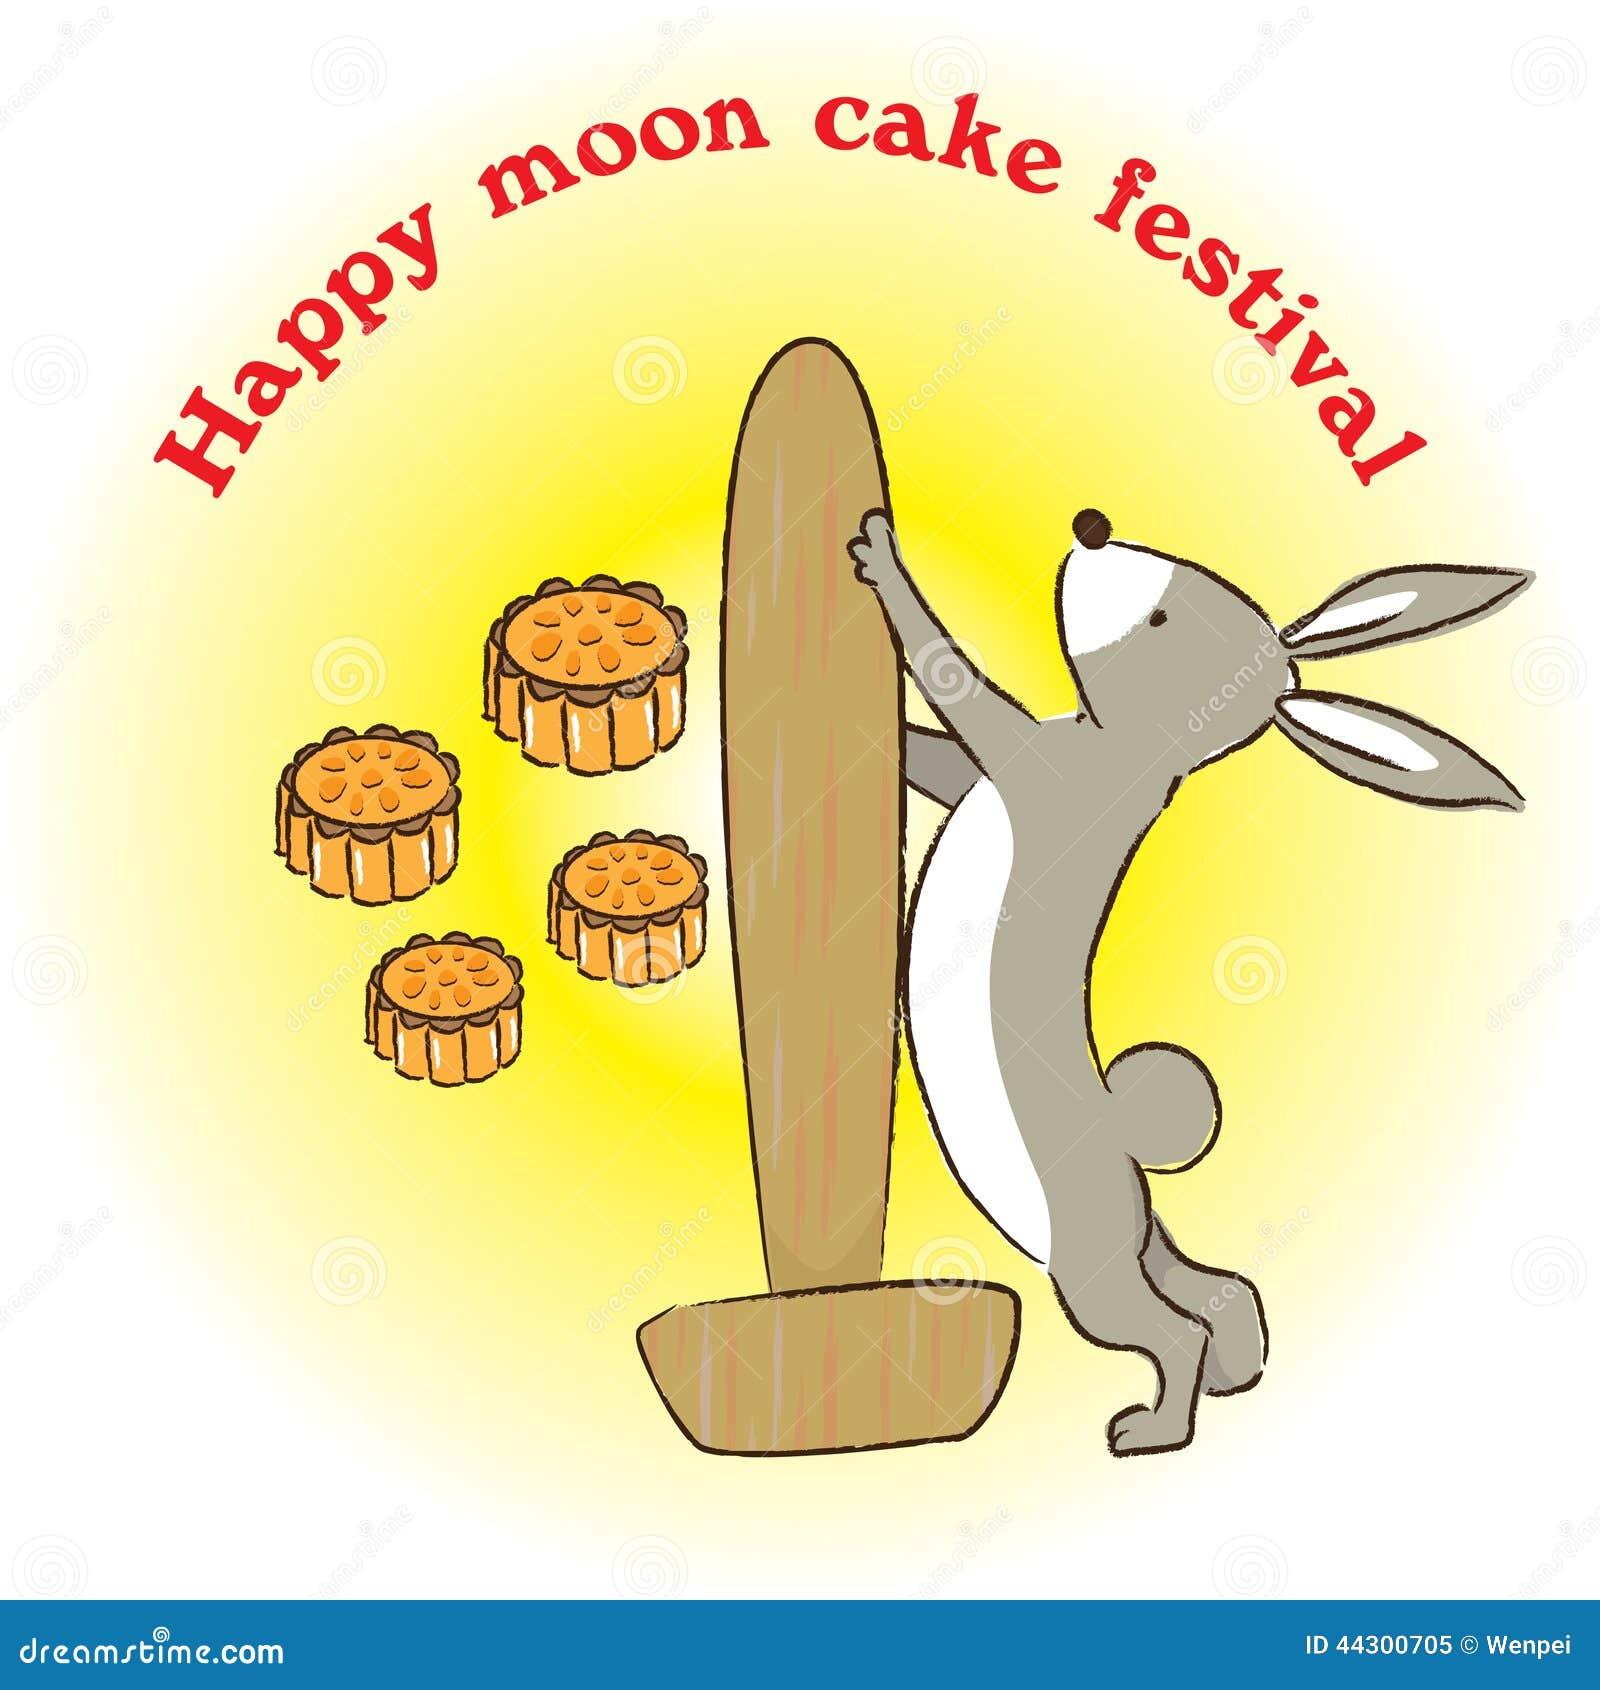 Moon Cake Cartoon Images : Happy Moon Cake Festival Stock Illustration - Image: 44300705